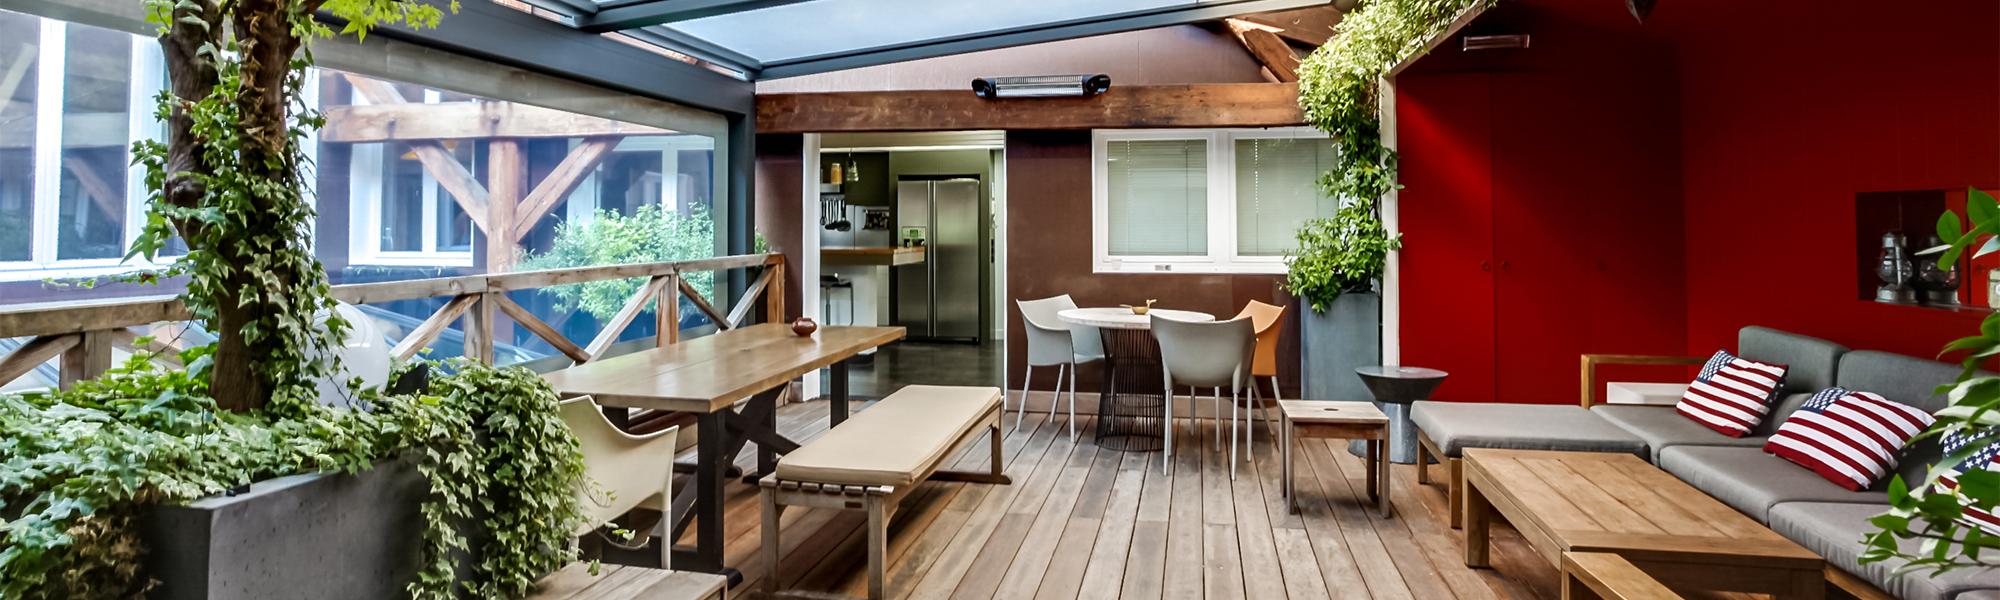 salle atypique bird office. Black Bedroom Furniture Sets. Home Design Ideas